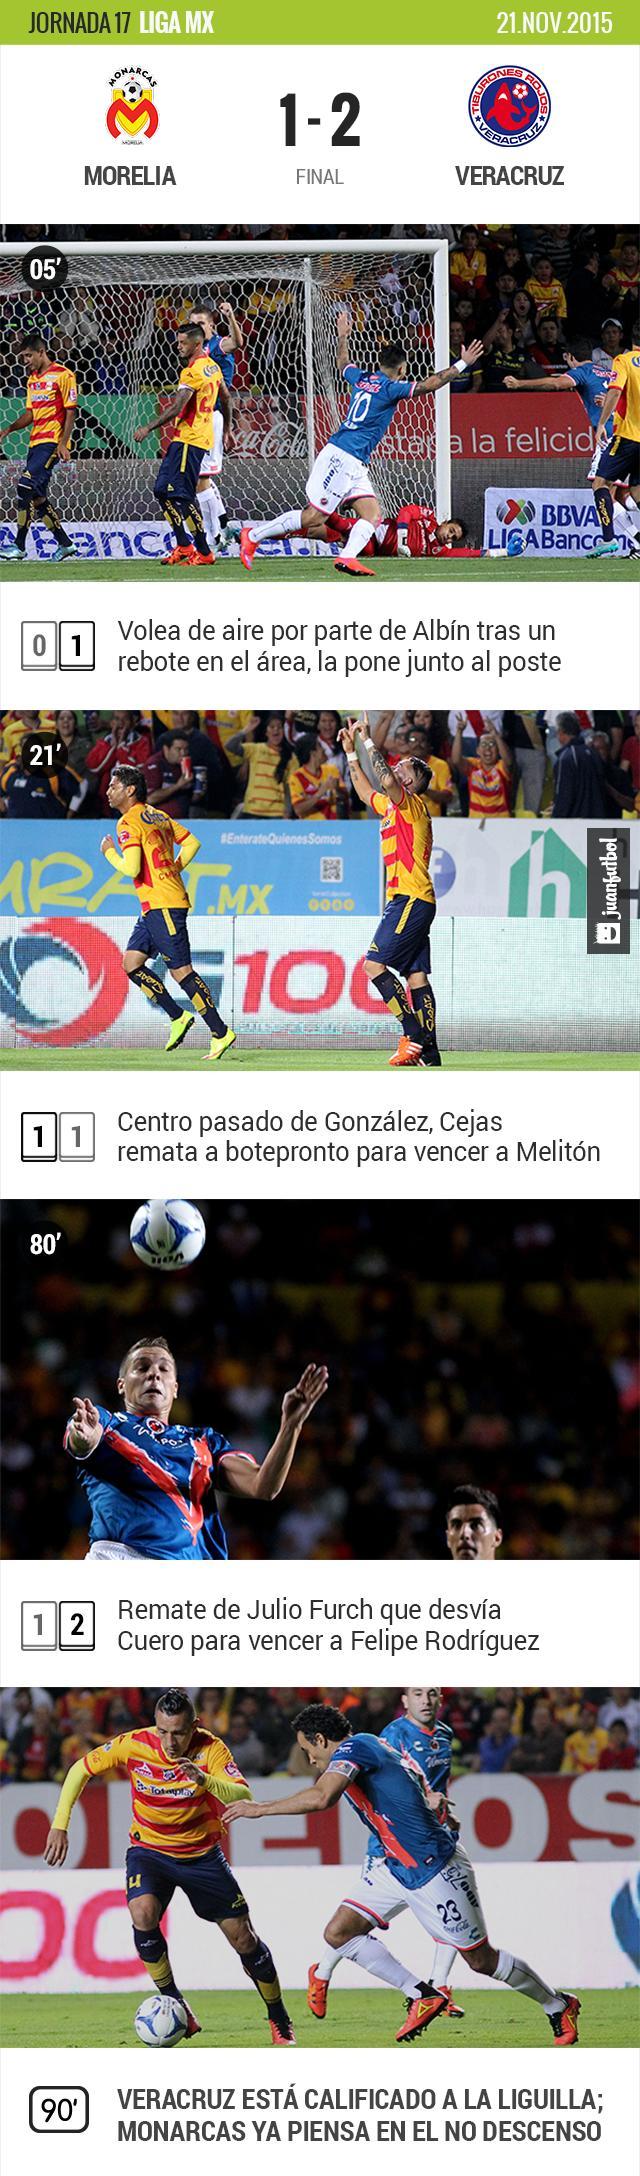 Morelia 1-2 Veracruz